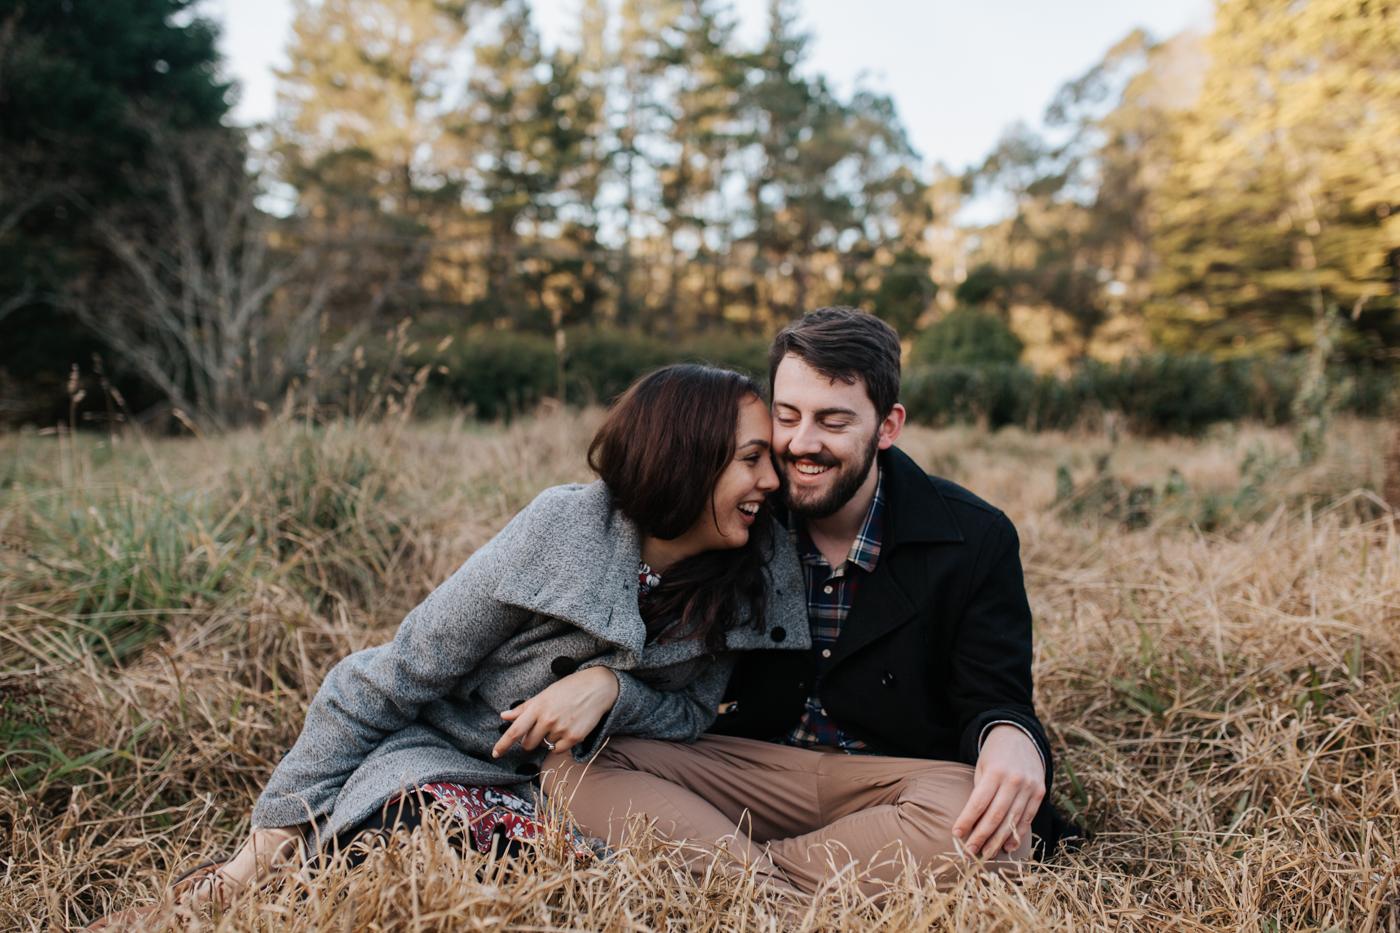 Kate & Kieran - Southern Highlands Engagement - Samantha Heather Photography-53.jpg